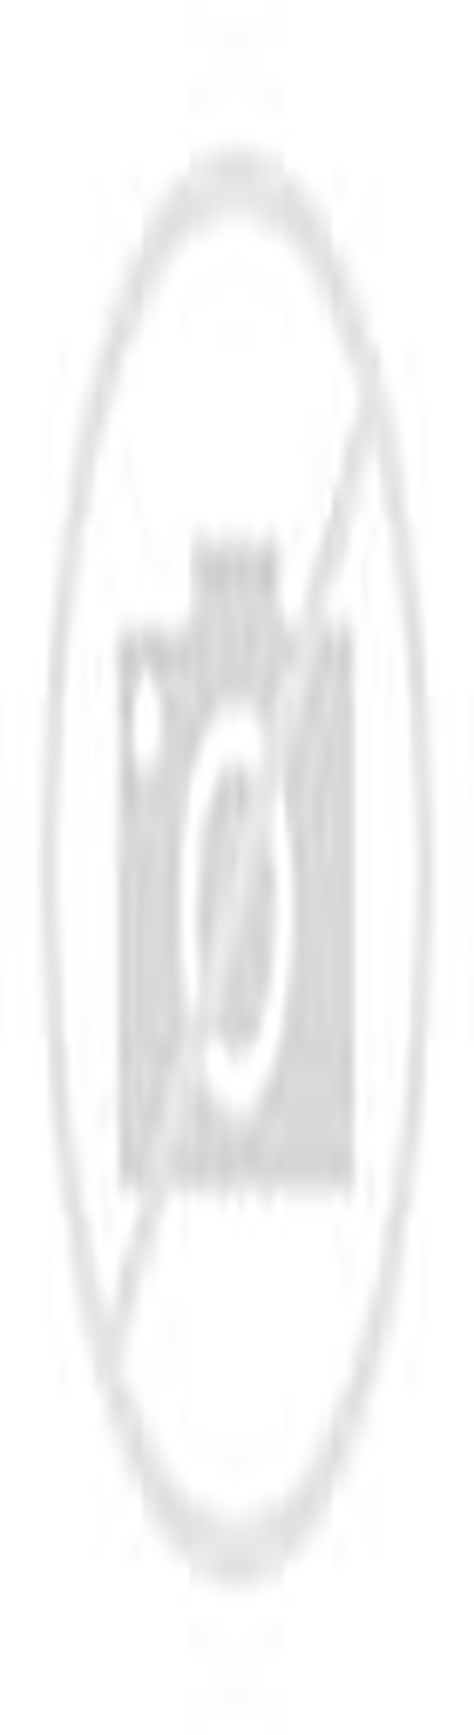 Most Energy Efficient Windows Ideas Energy Efficiency Series Benefits Of Energy Efficient Windows